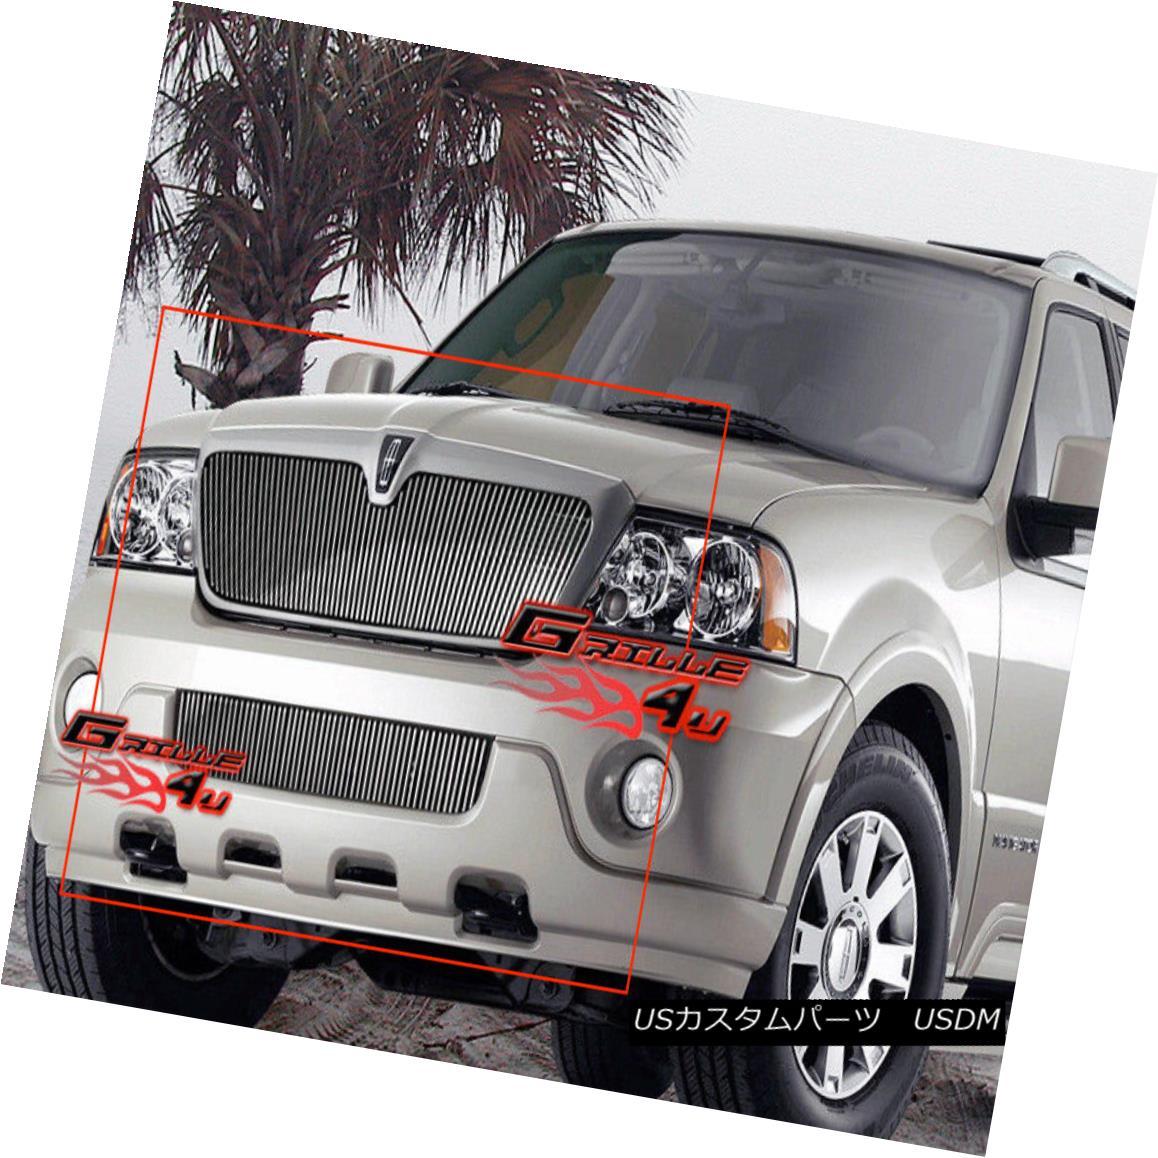 Aluminum Vertical Grille Combo For 03-04 Lincoln Navigator